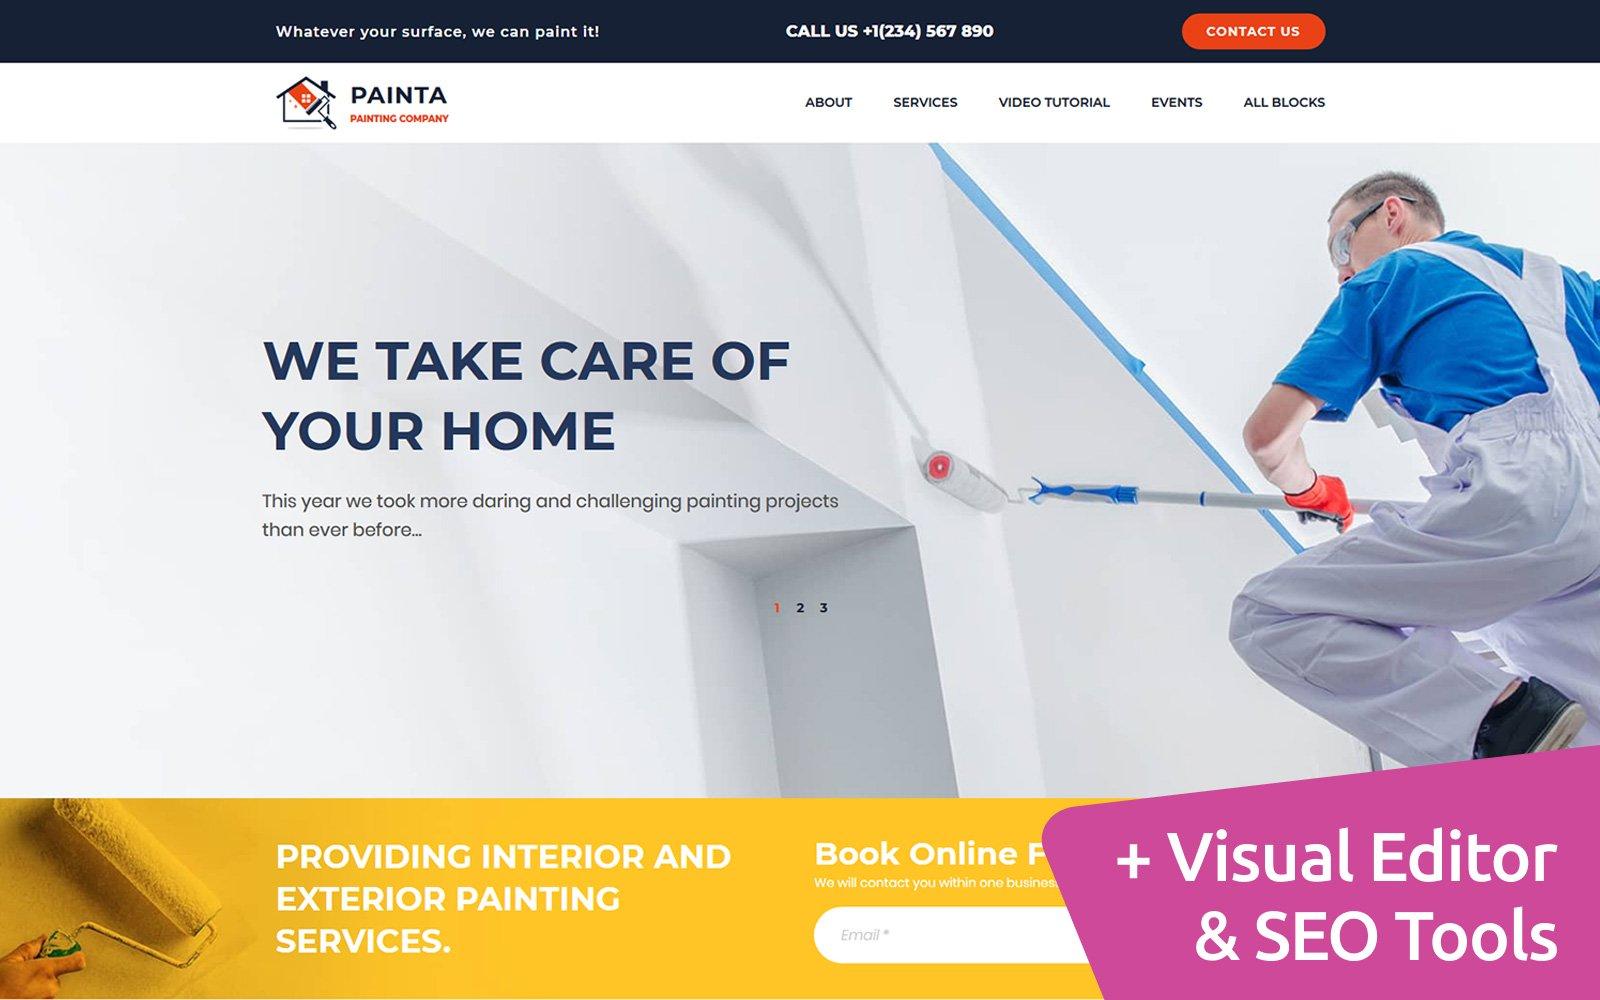 """Painta - Painting Company MotoCMS"" 着陆页模板 #107318"